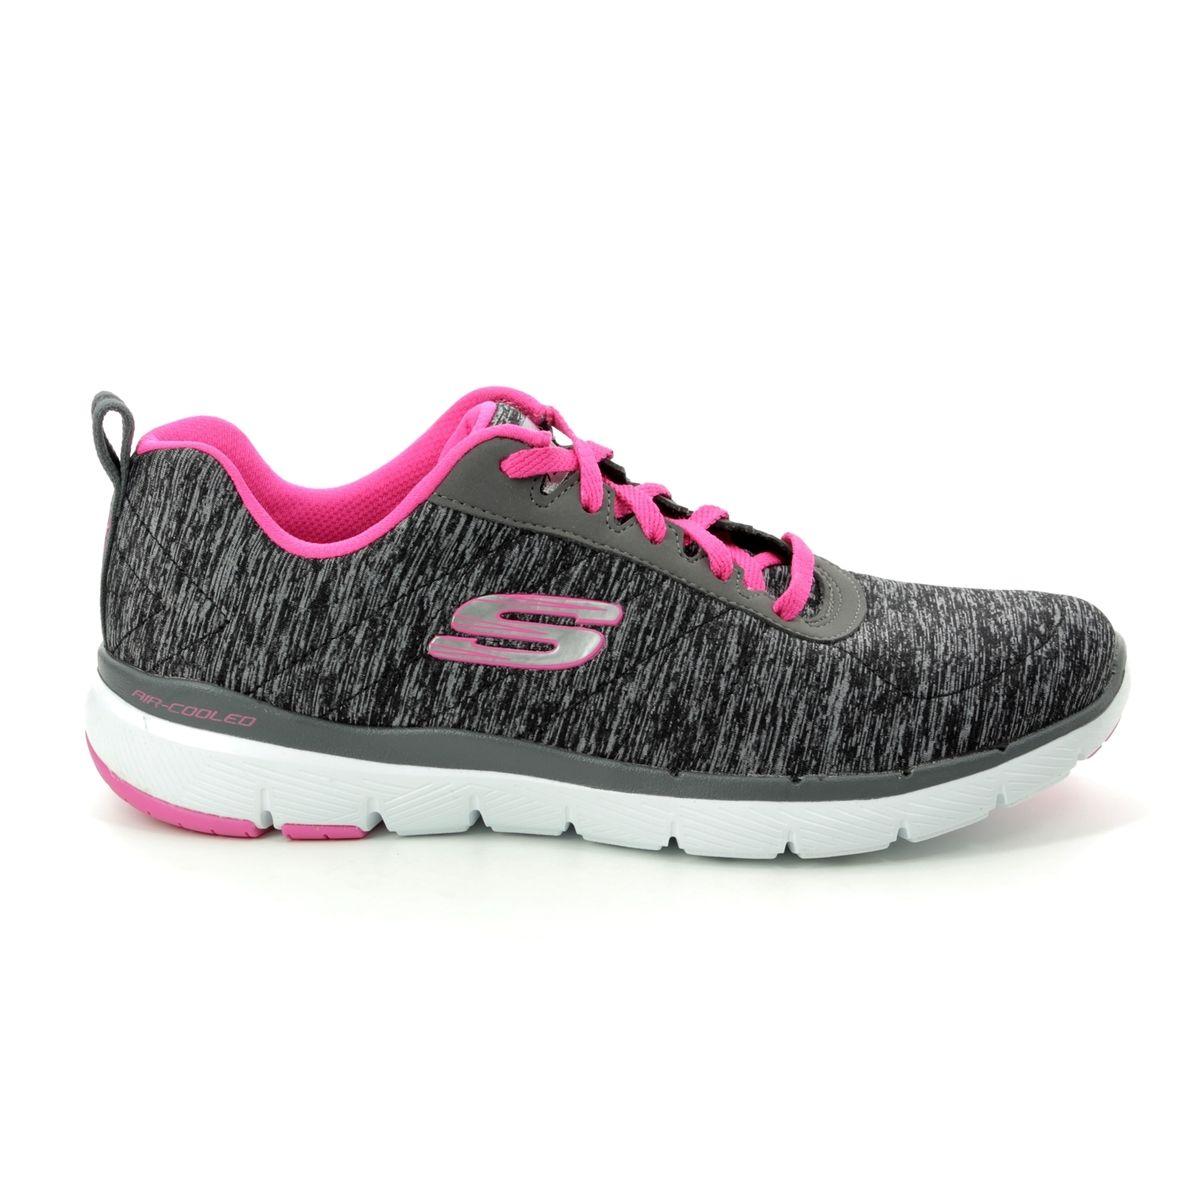 c2568ca243b8 Skechers Insiders Flex 13067 BKHP Black hot pink trainers